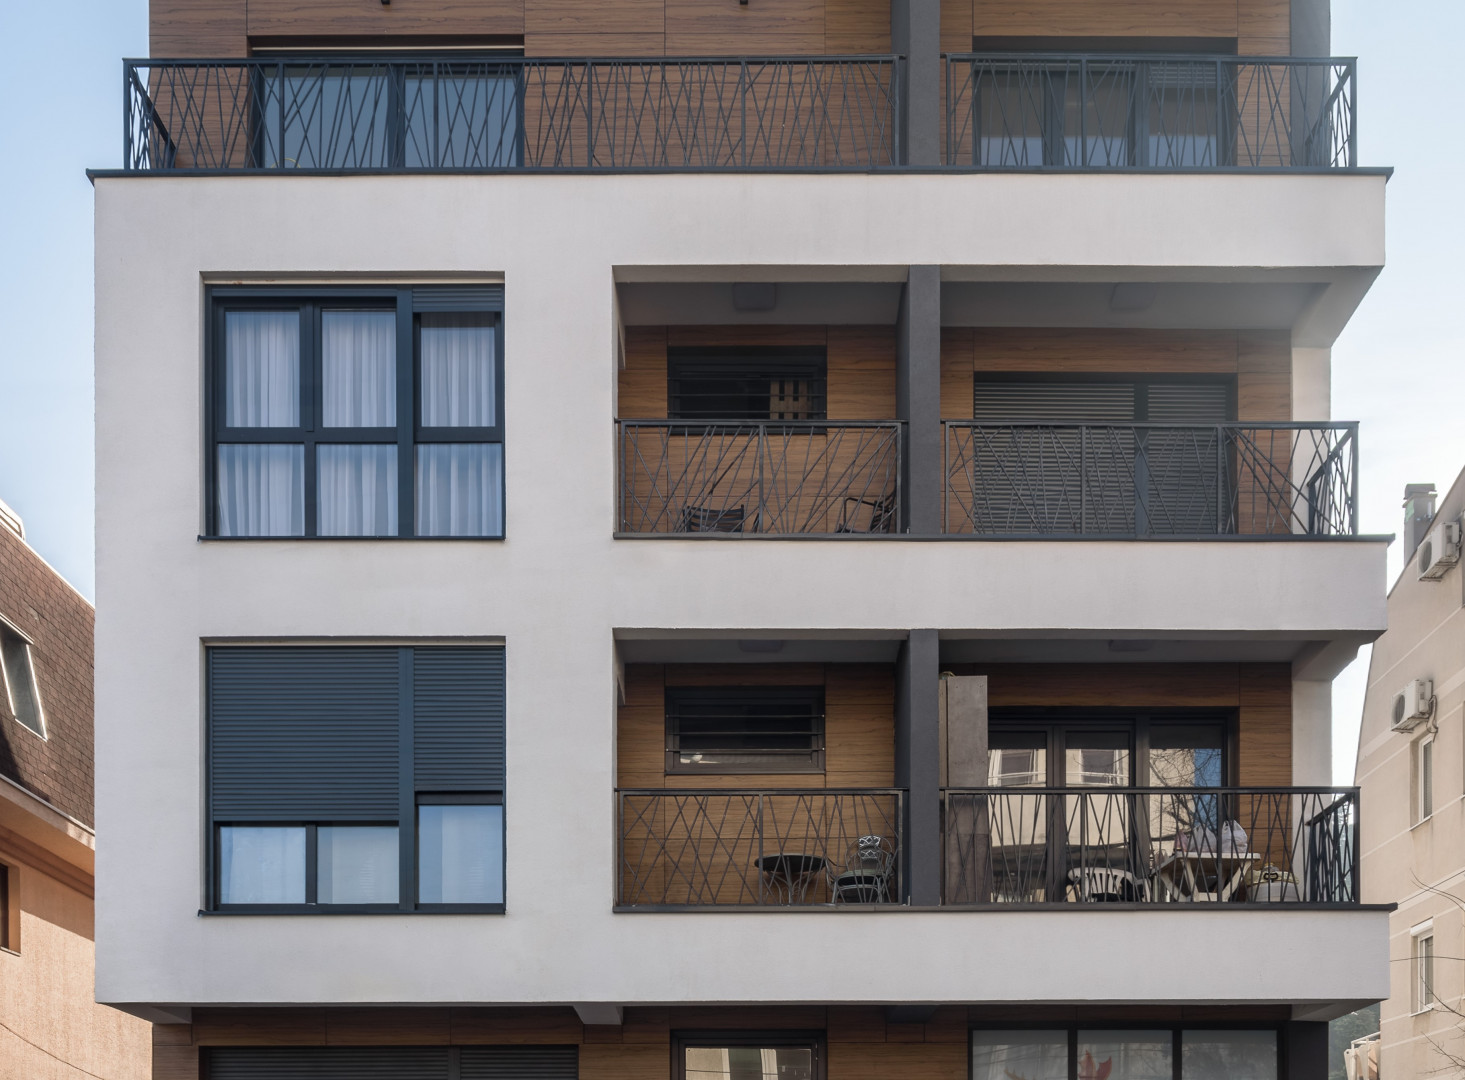 Baumit life challange, Pariska